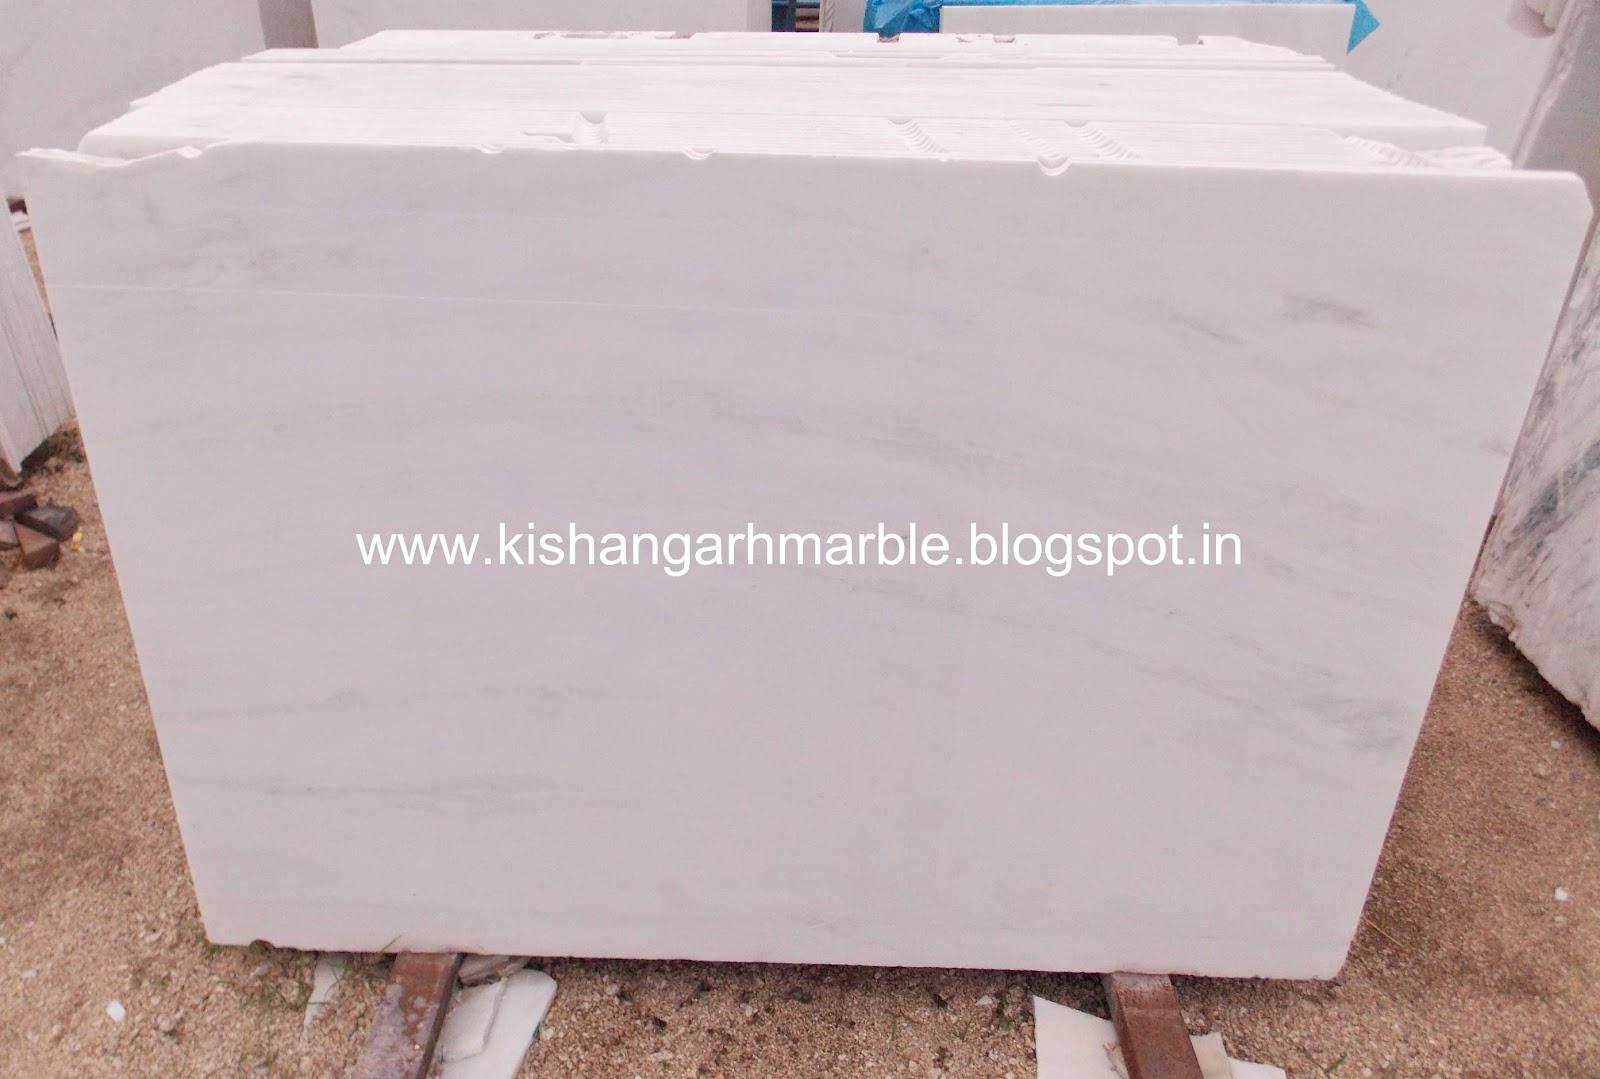 Kishangarh Marble: MORWAD WHITE MARBLE